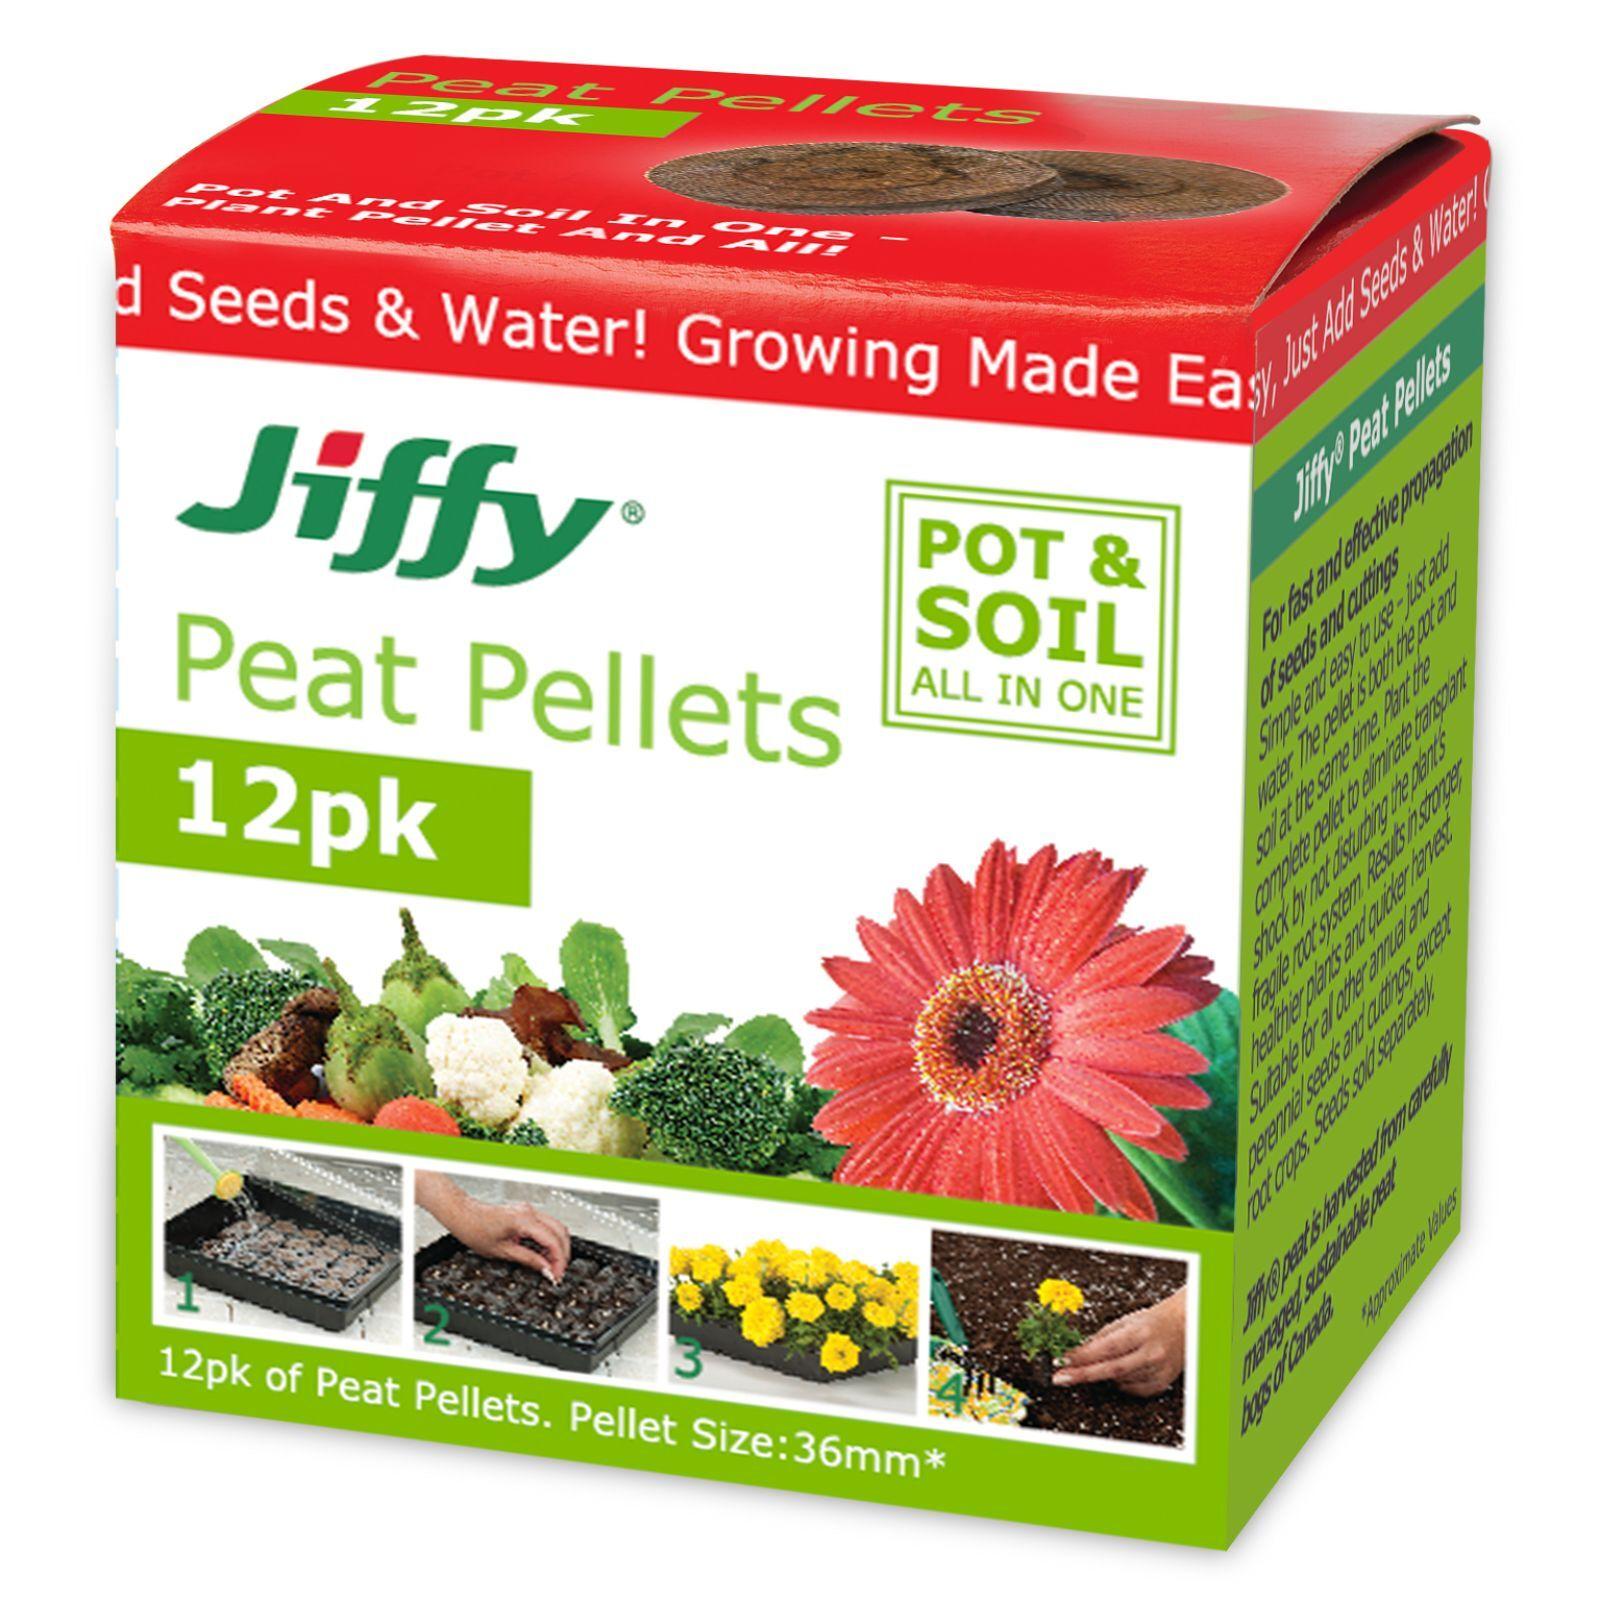 Mr Fothergill's Jiffy 36mm Peat Pellet - 12 Pack